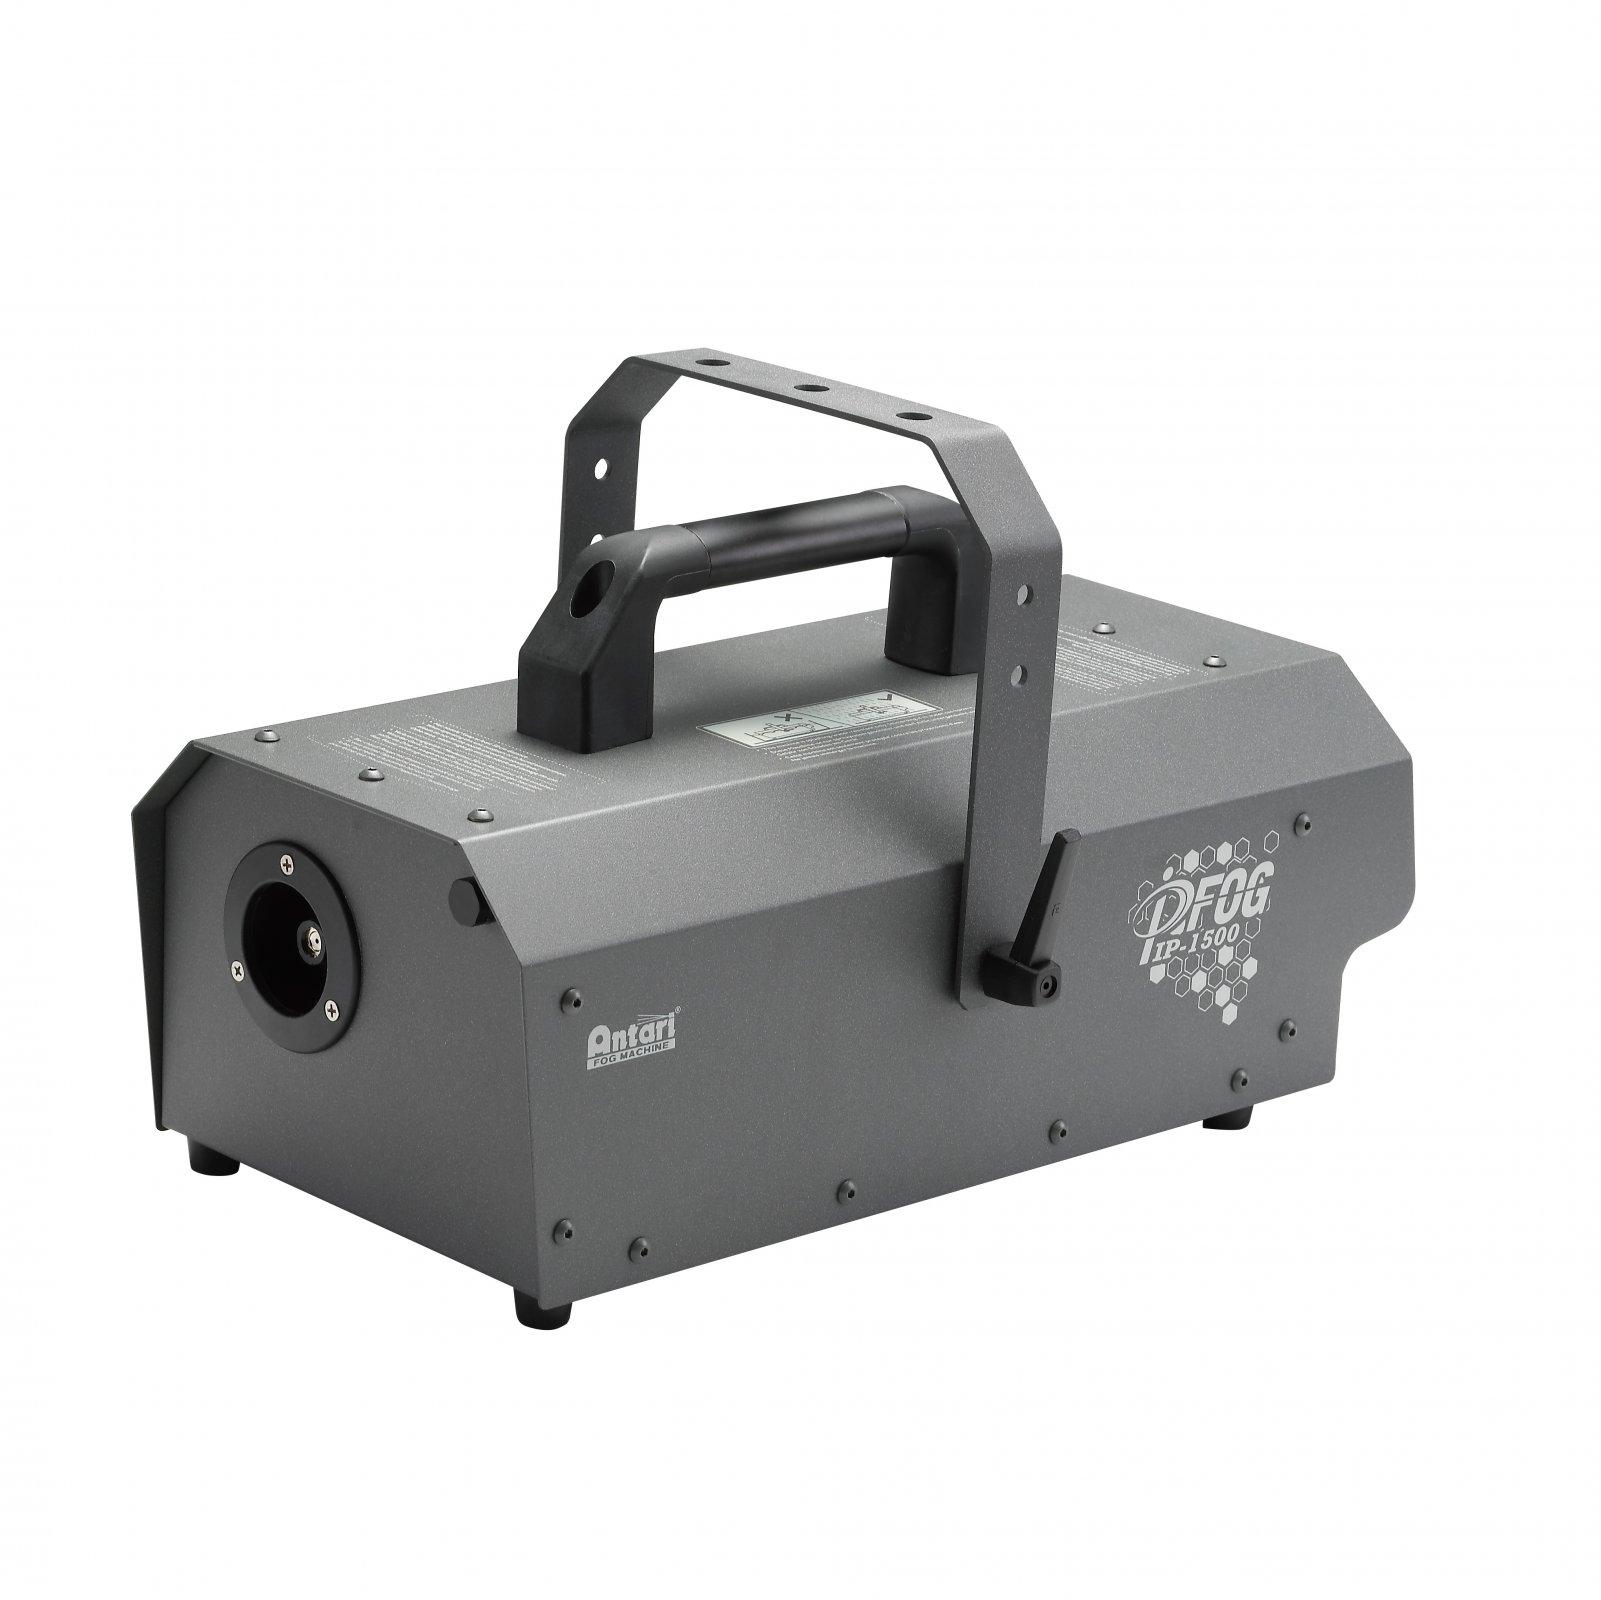 Antari IP-1500 Fog Machine - 1500W, IP63 Rated Outdoor Fogger